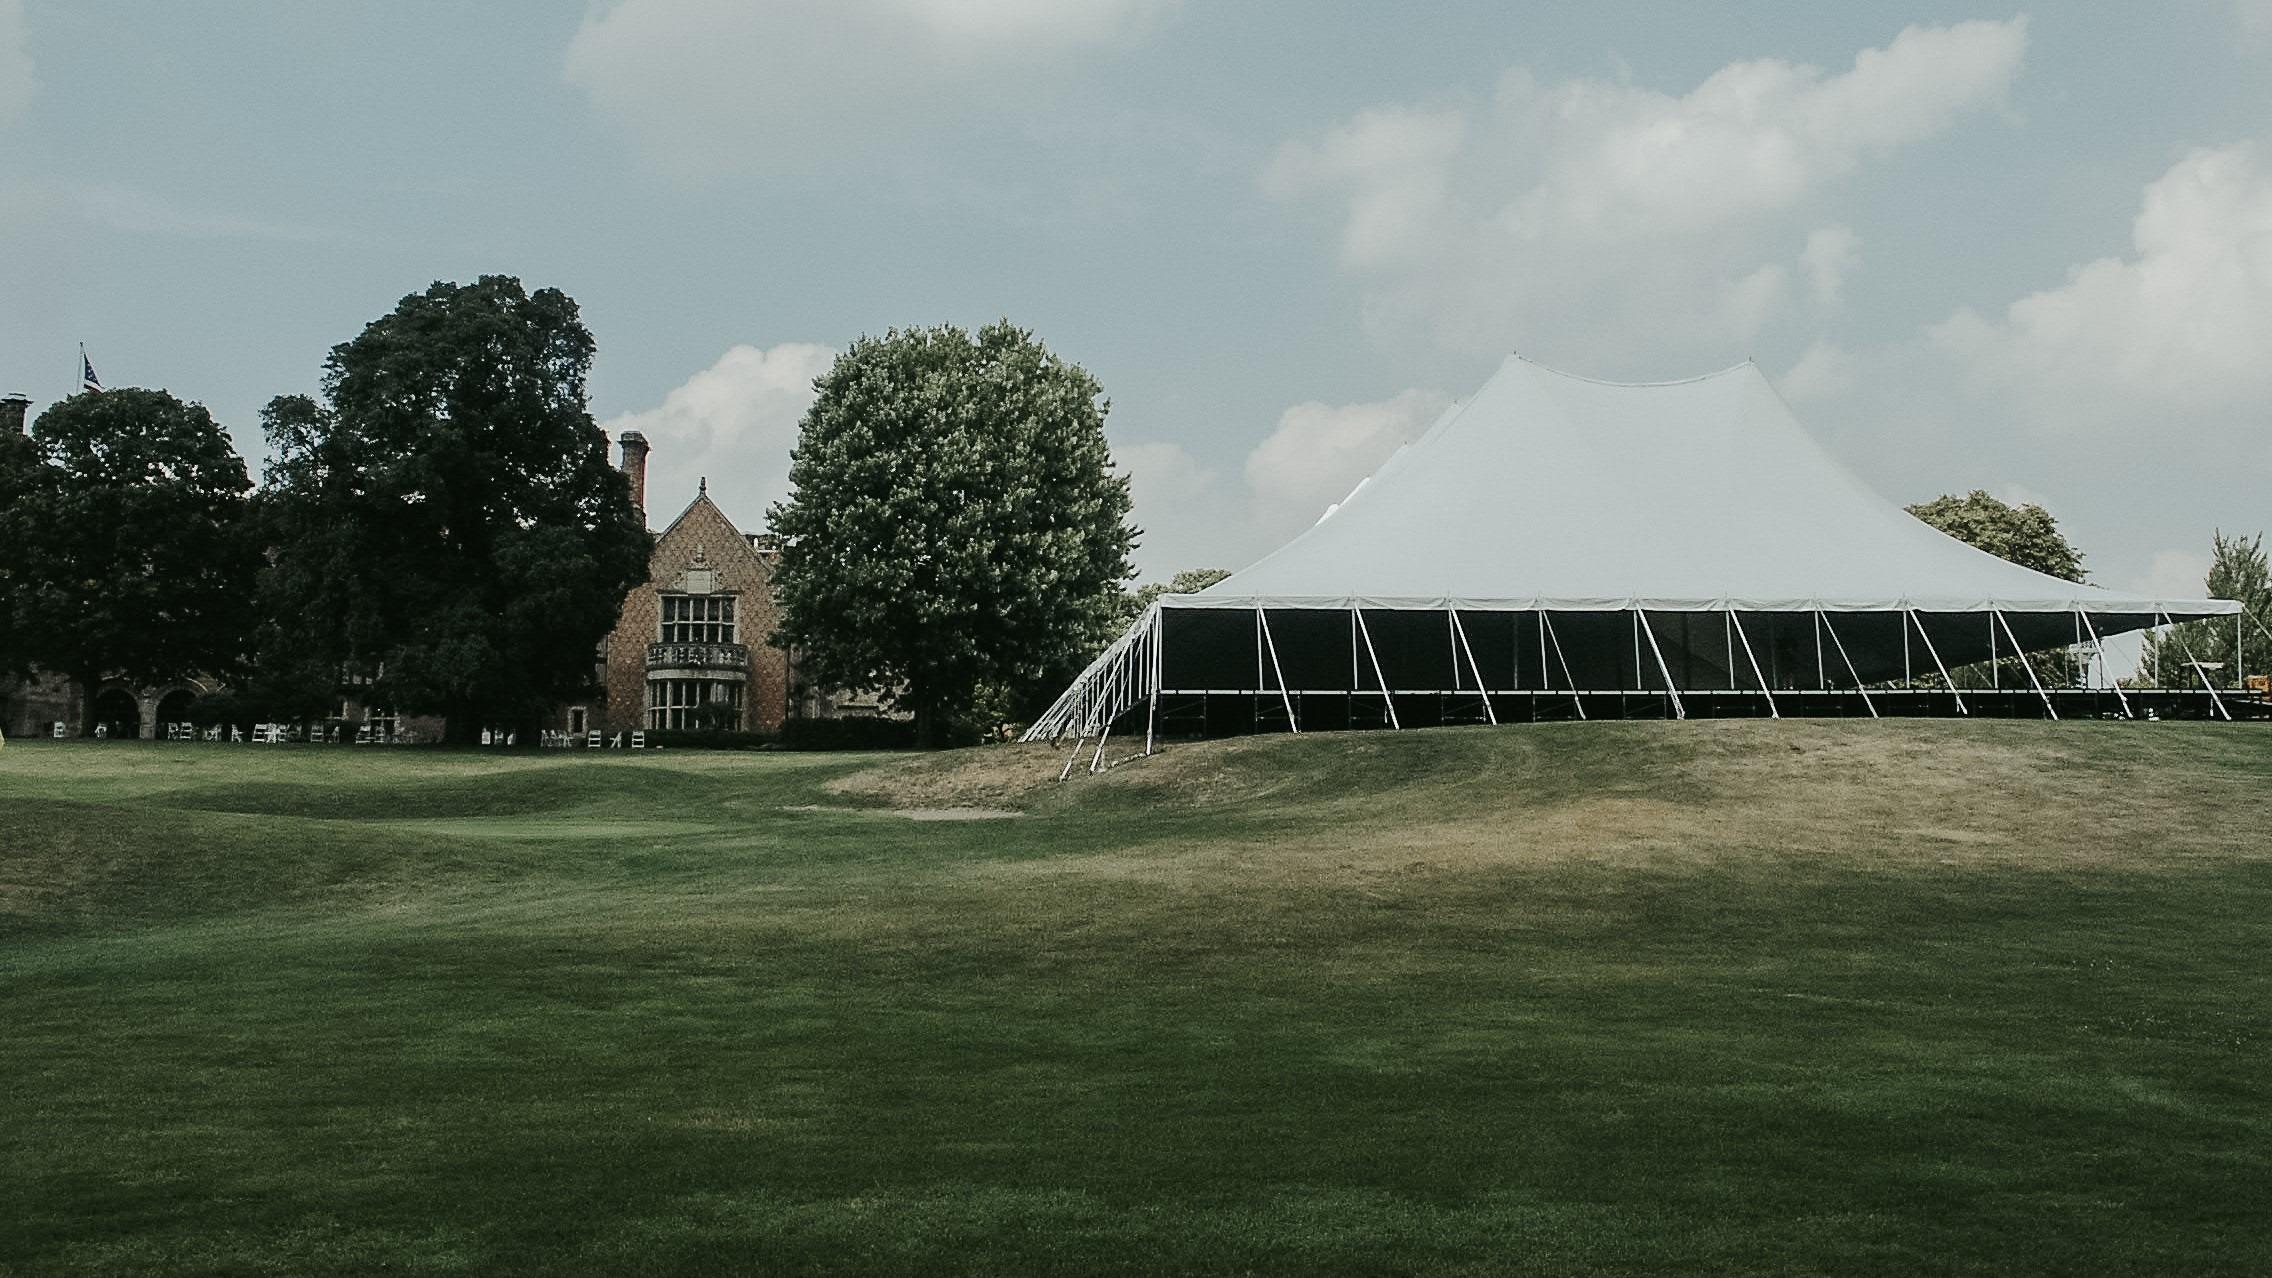 100x175 Pole Tent